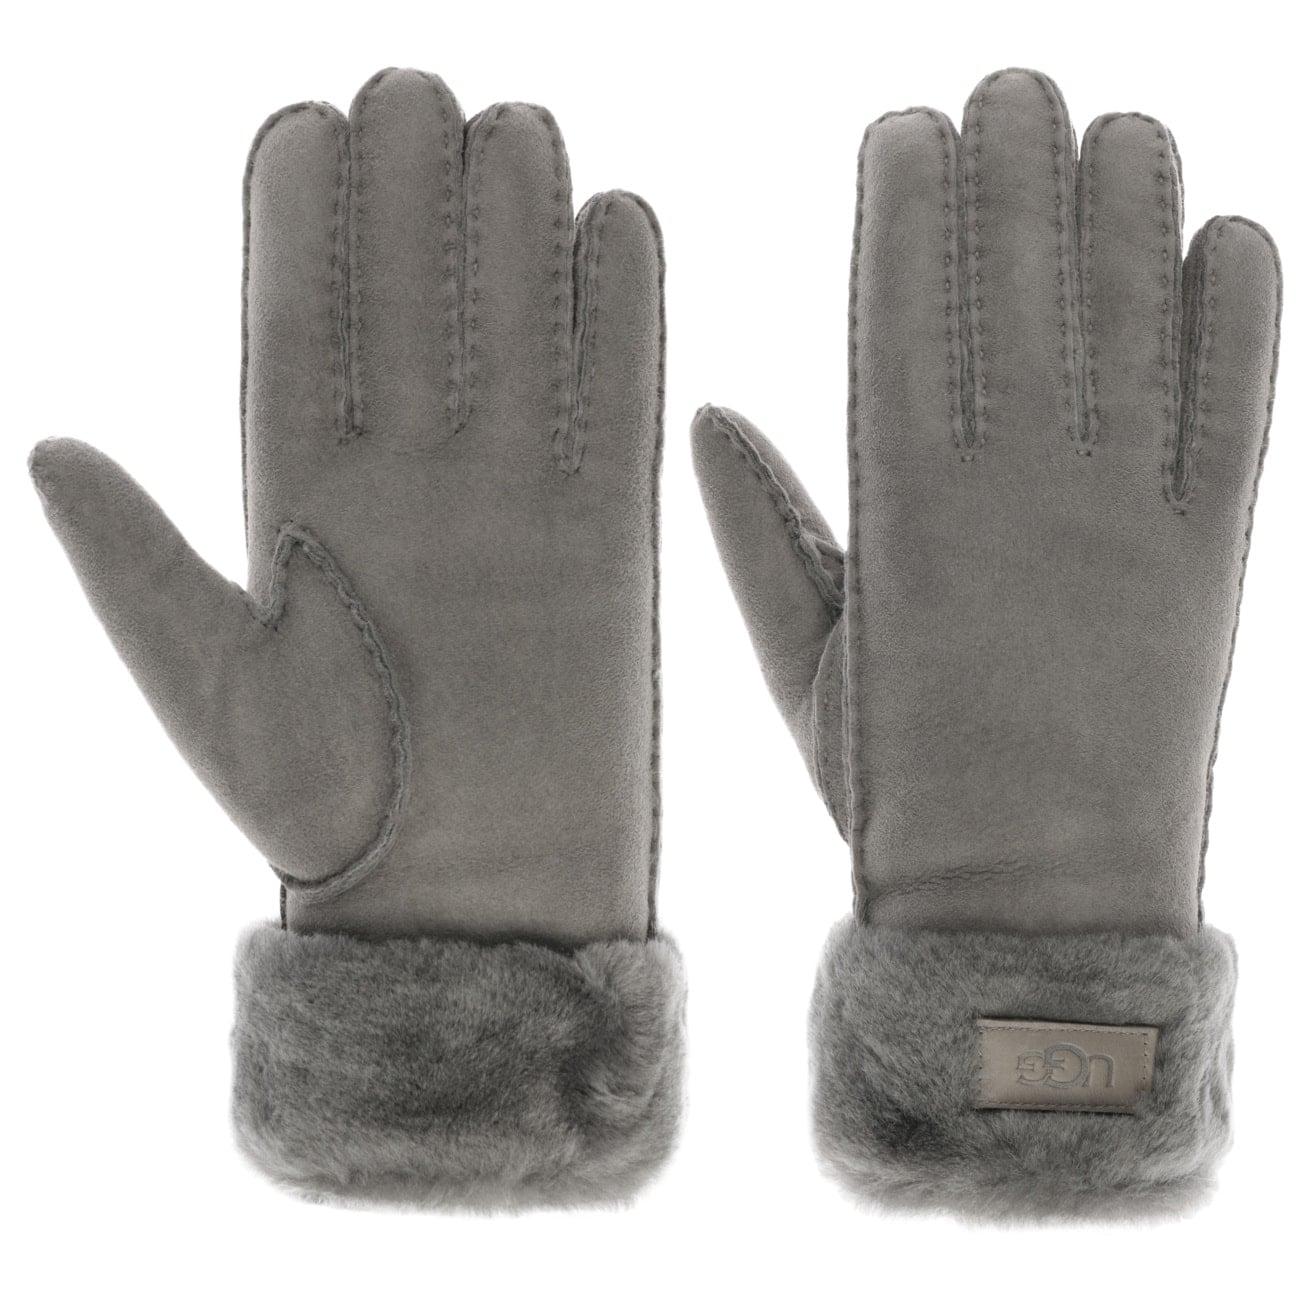 handschuhe mode winter damen herren gestrickte arm fingerlose handschuhe unisex weiche warme. Black Bedroom Furniture Sets. Home Design Ideas